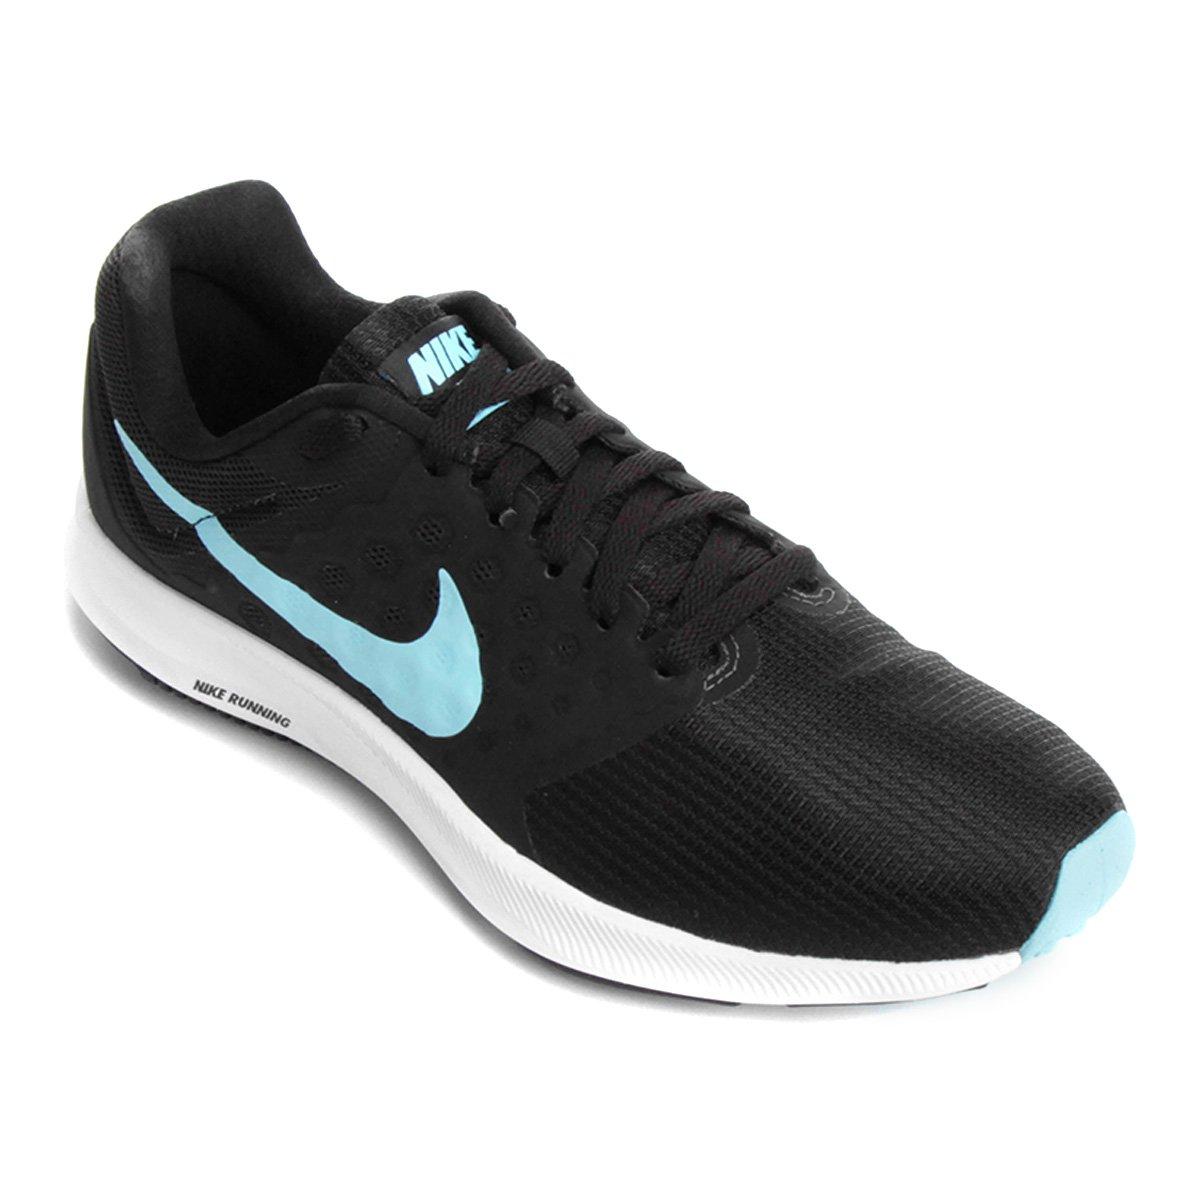 c550aa3211 Tênis Nike Downshifter 7 Feminino - Preto e Azul - Compre Agora ...